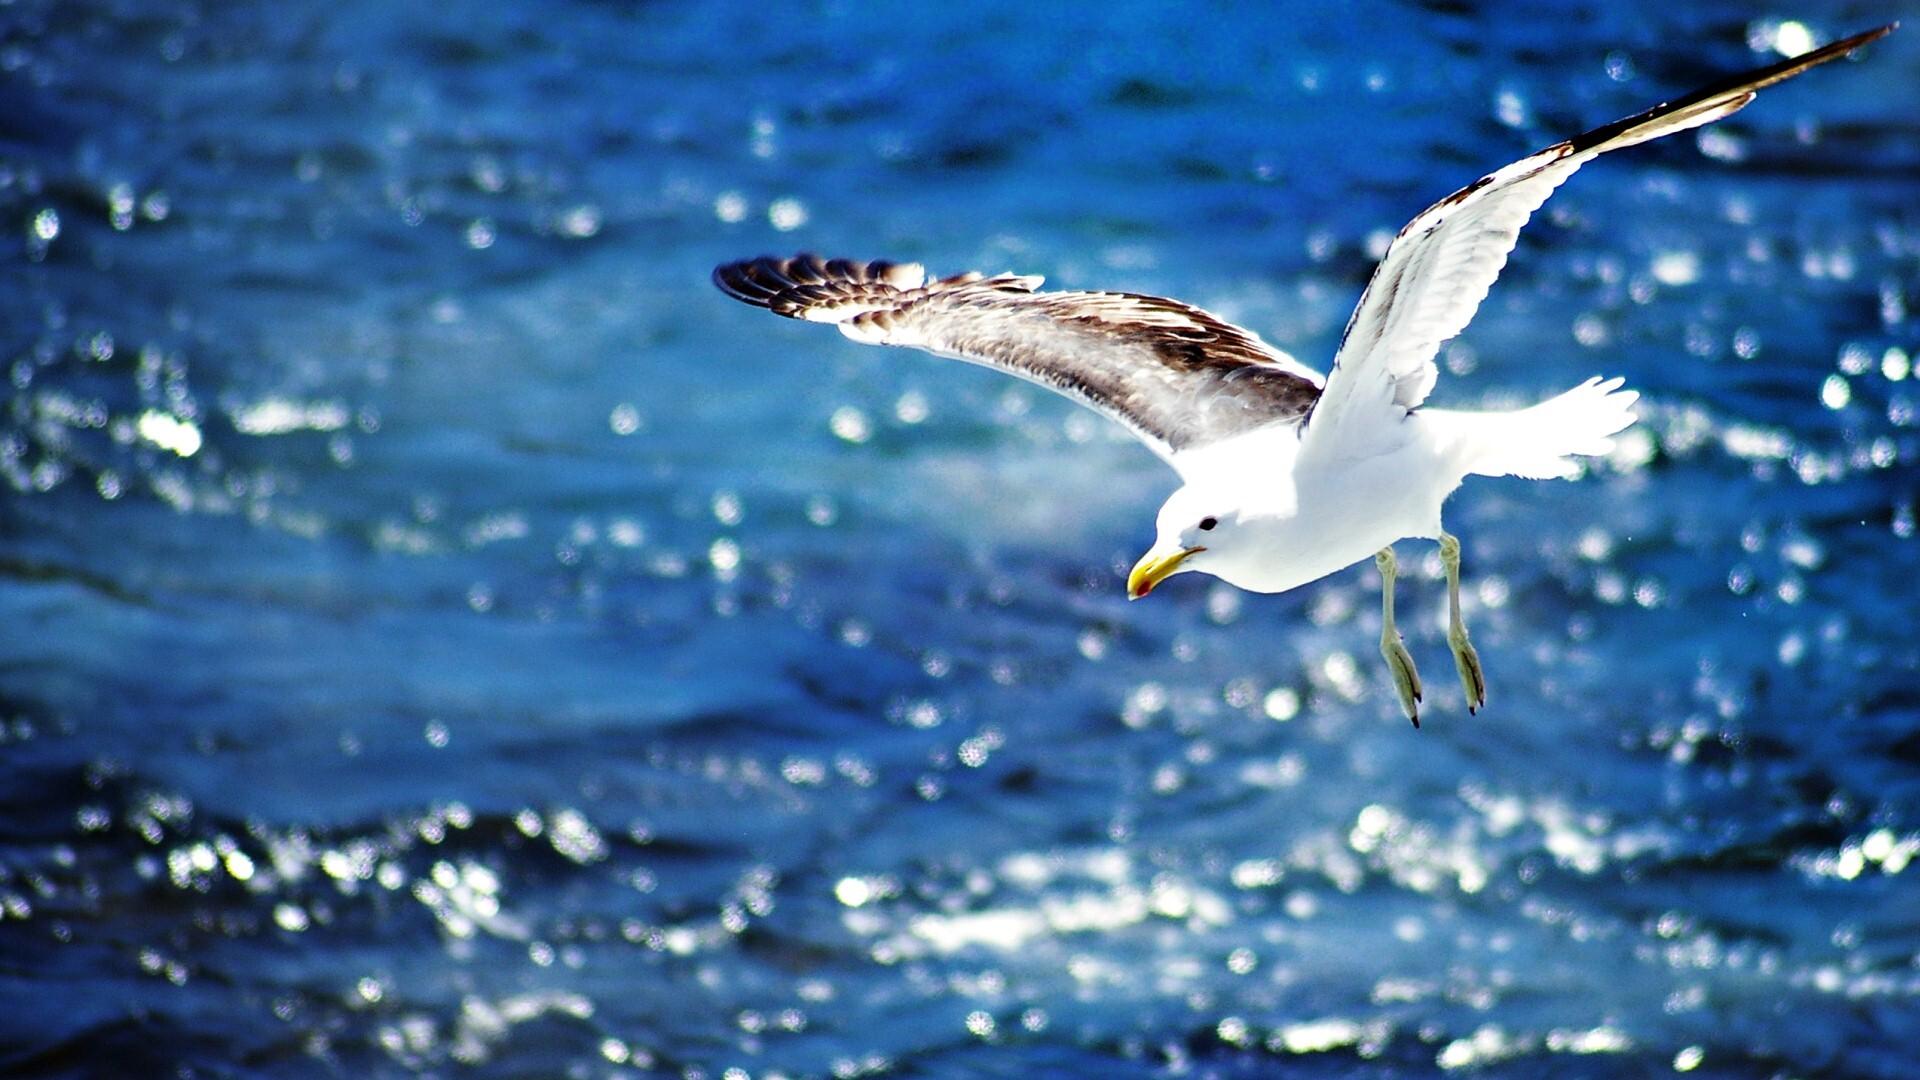 Beautiful Seagull Desktop Wallpaper Hd 3840x2160